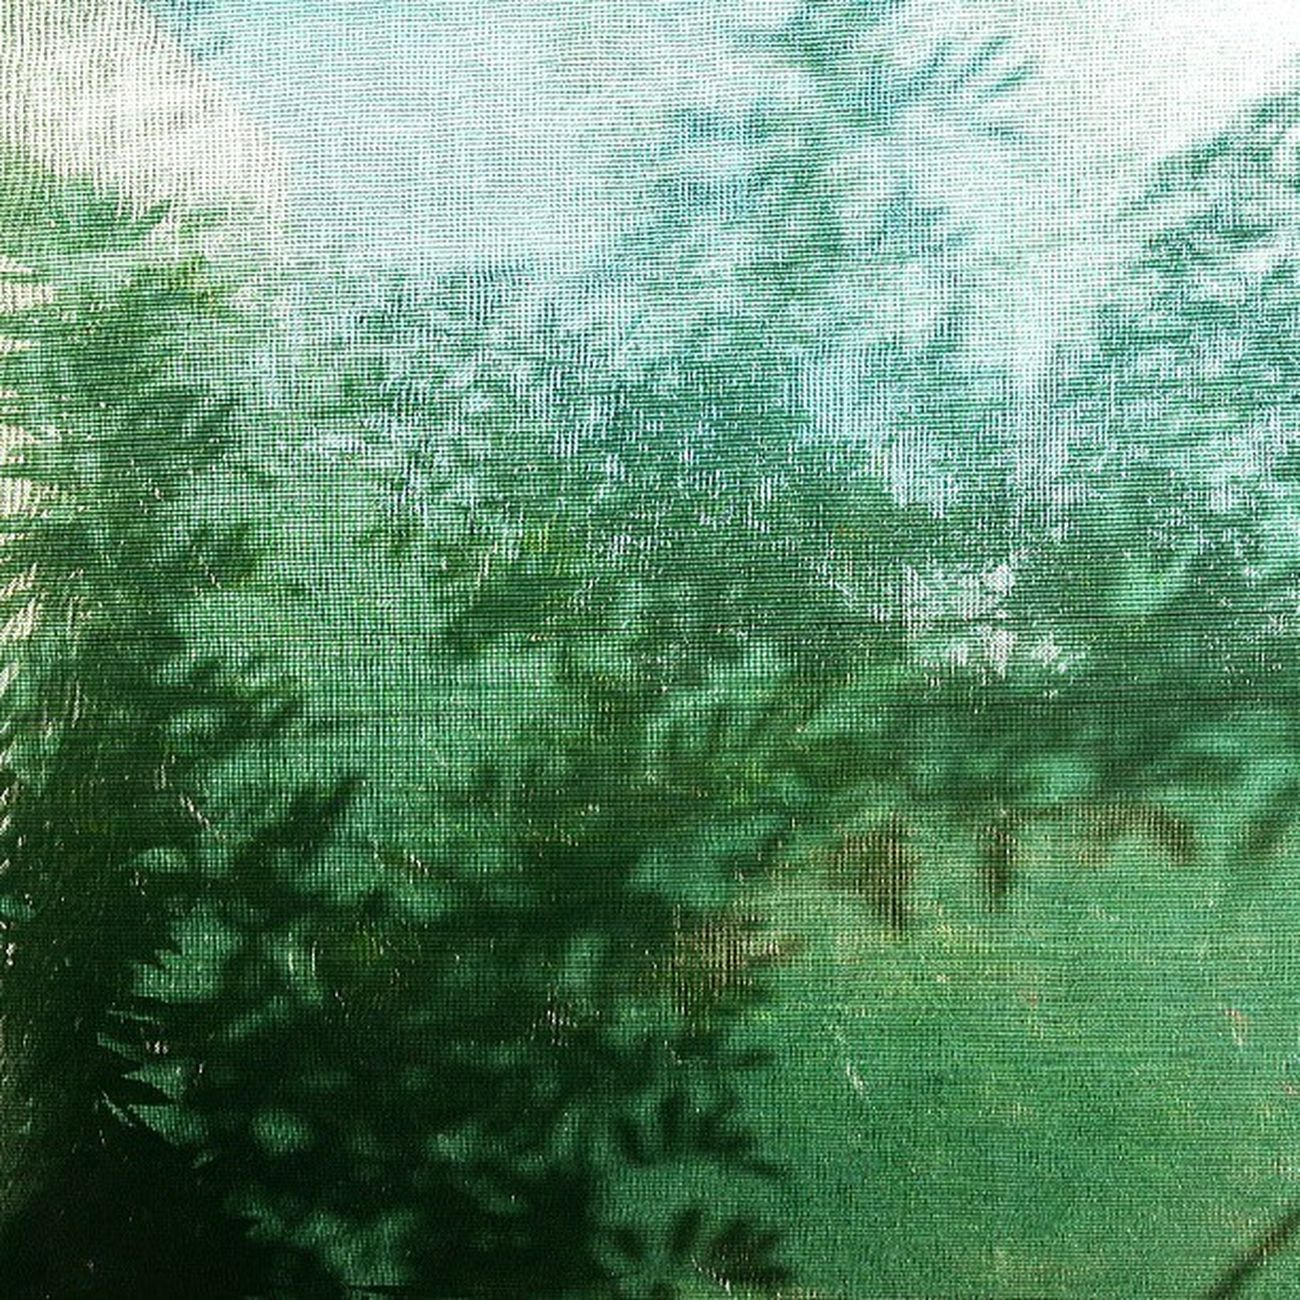 Insta_global Iglady Igminimal Ig_captures insrael ig_israel instamood il_instagram ig_exquisite ig_minimalshots jj_minimalism jj_forum jj_simplethings artphoto texture colorcharted_green color_fab instacolor insta_israel icatching shaddow